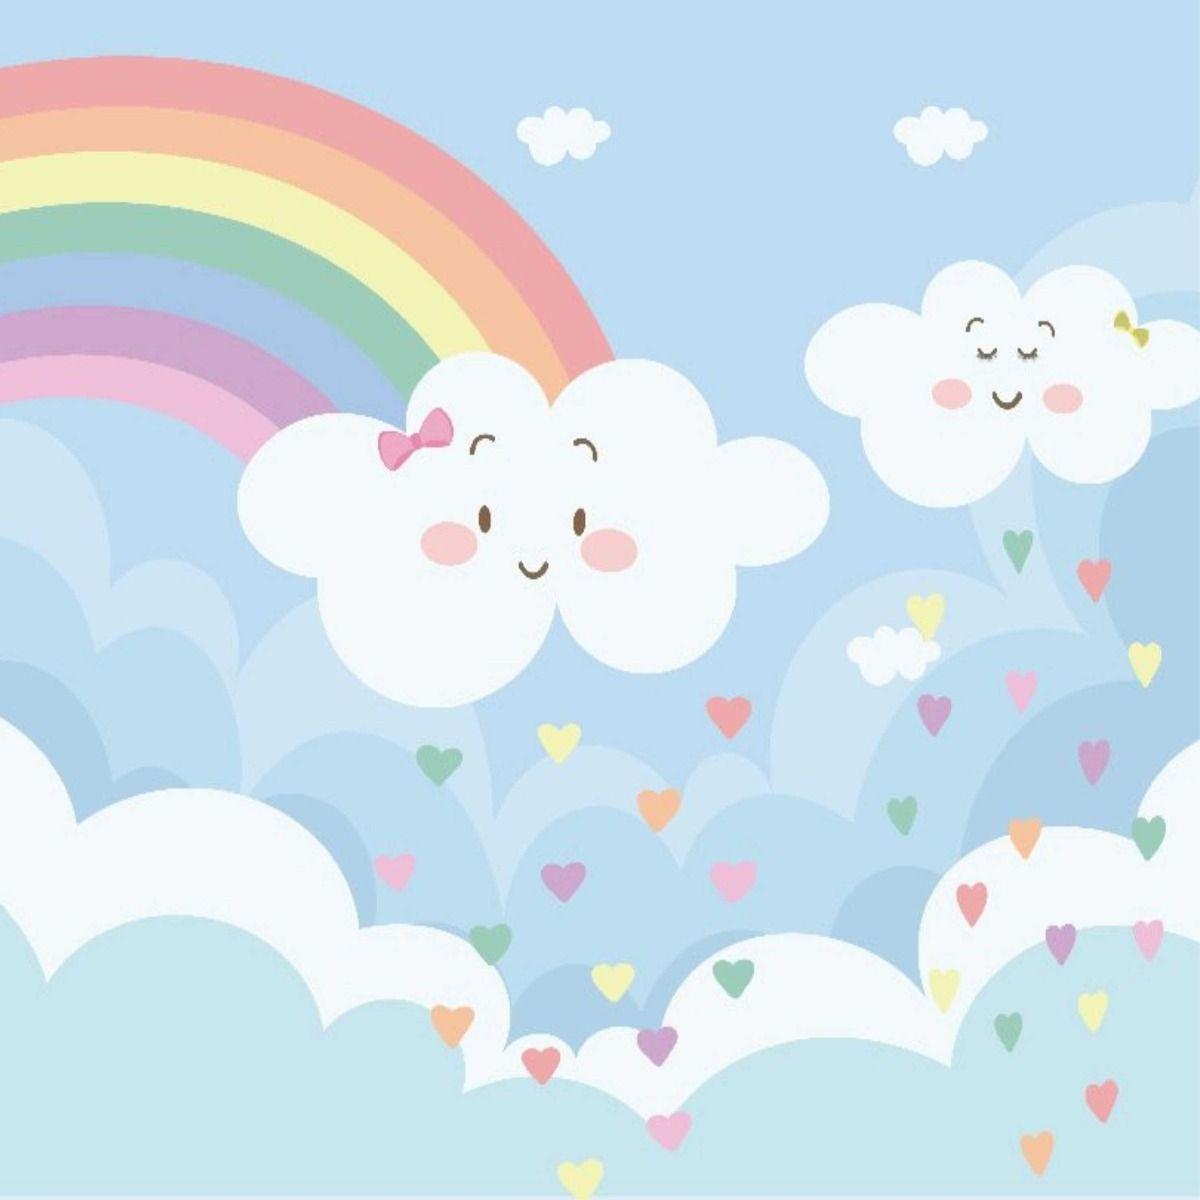 Rainbow Rain Clouds Festa Chuva De Bencao Chuva De Bencao